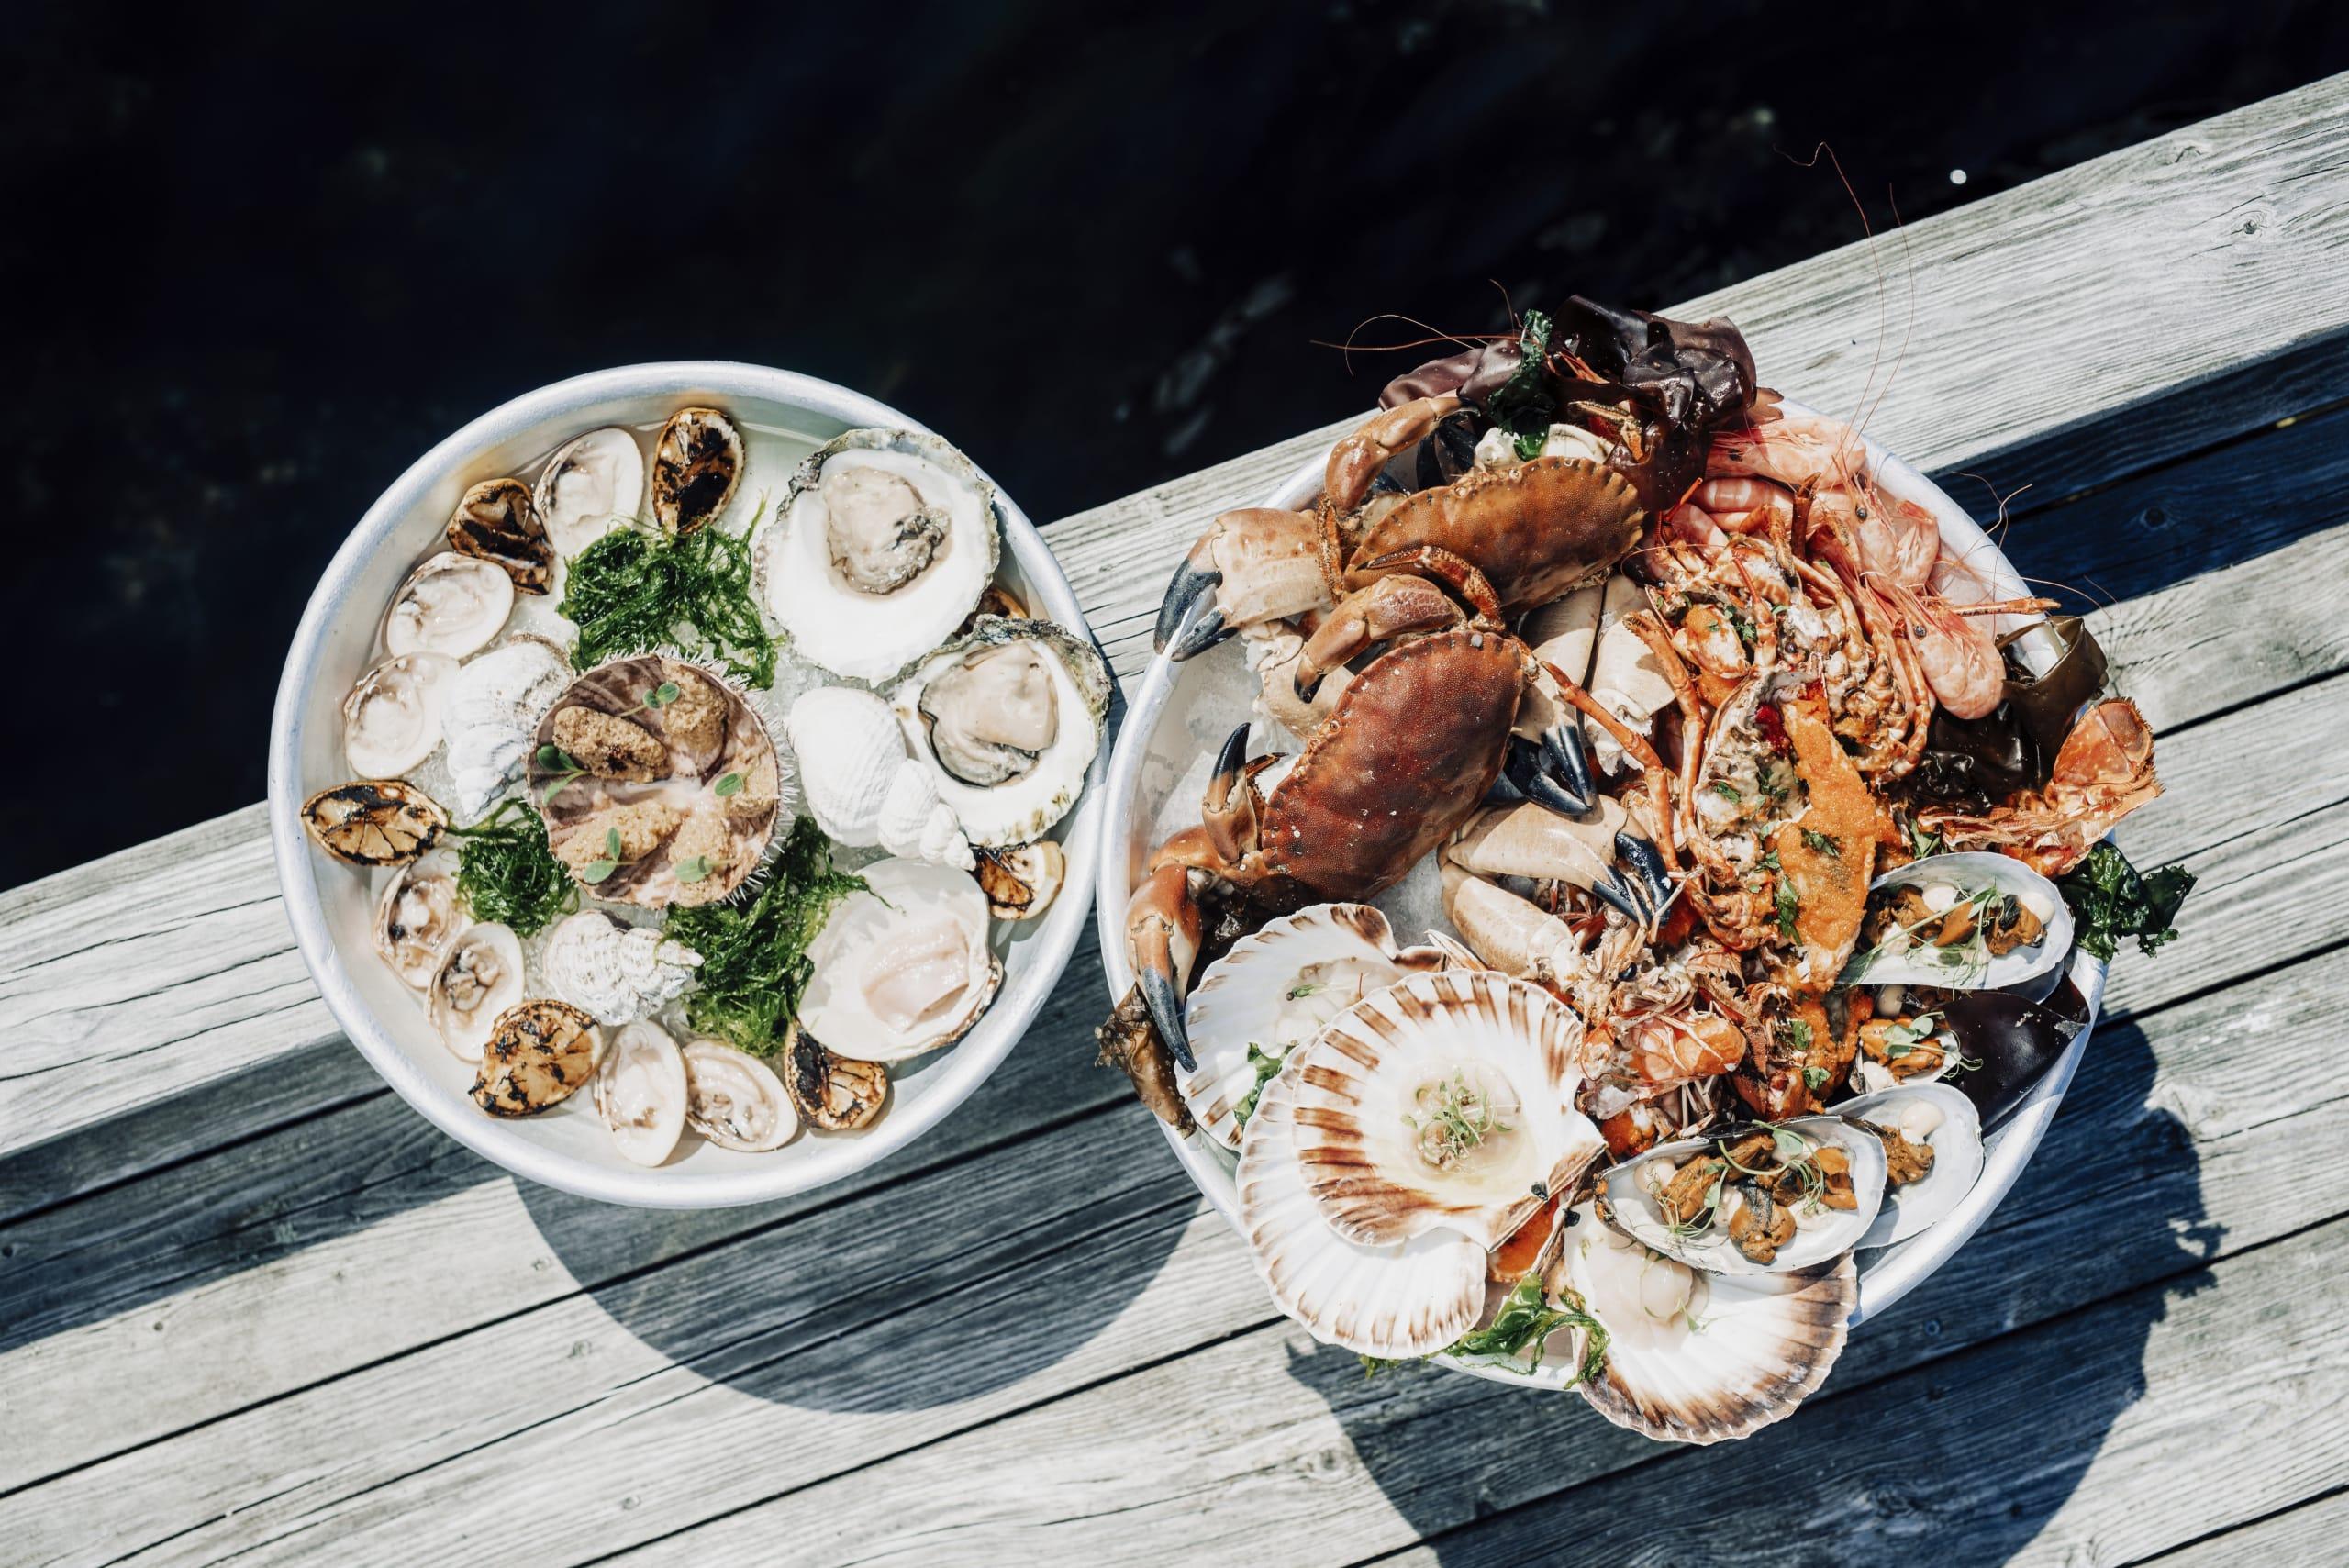 Shellfish tower at Cornelius seafood restaurant